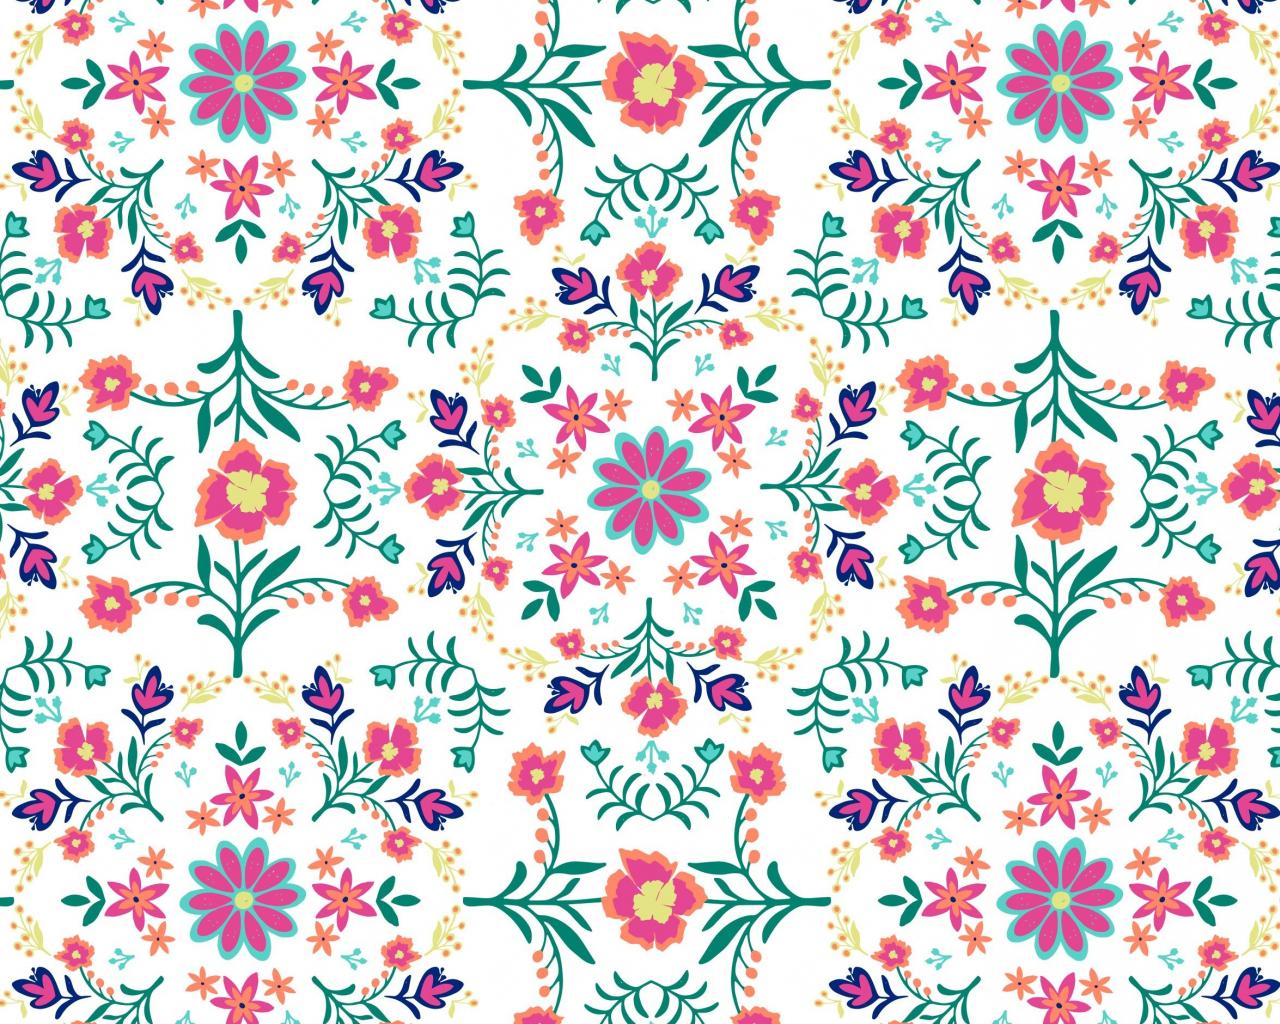 Free Download 62 Boho Desktop Wallpapers On Wallpaperplay